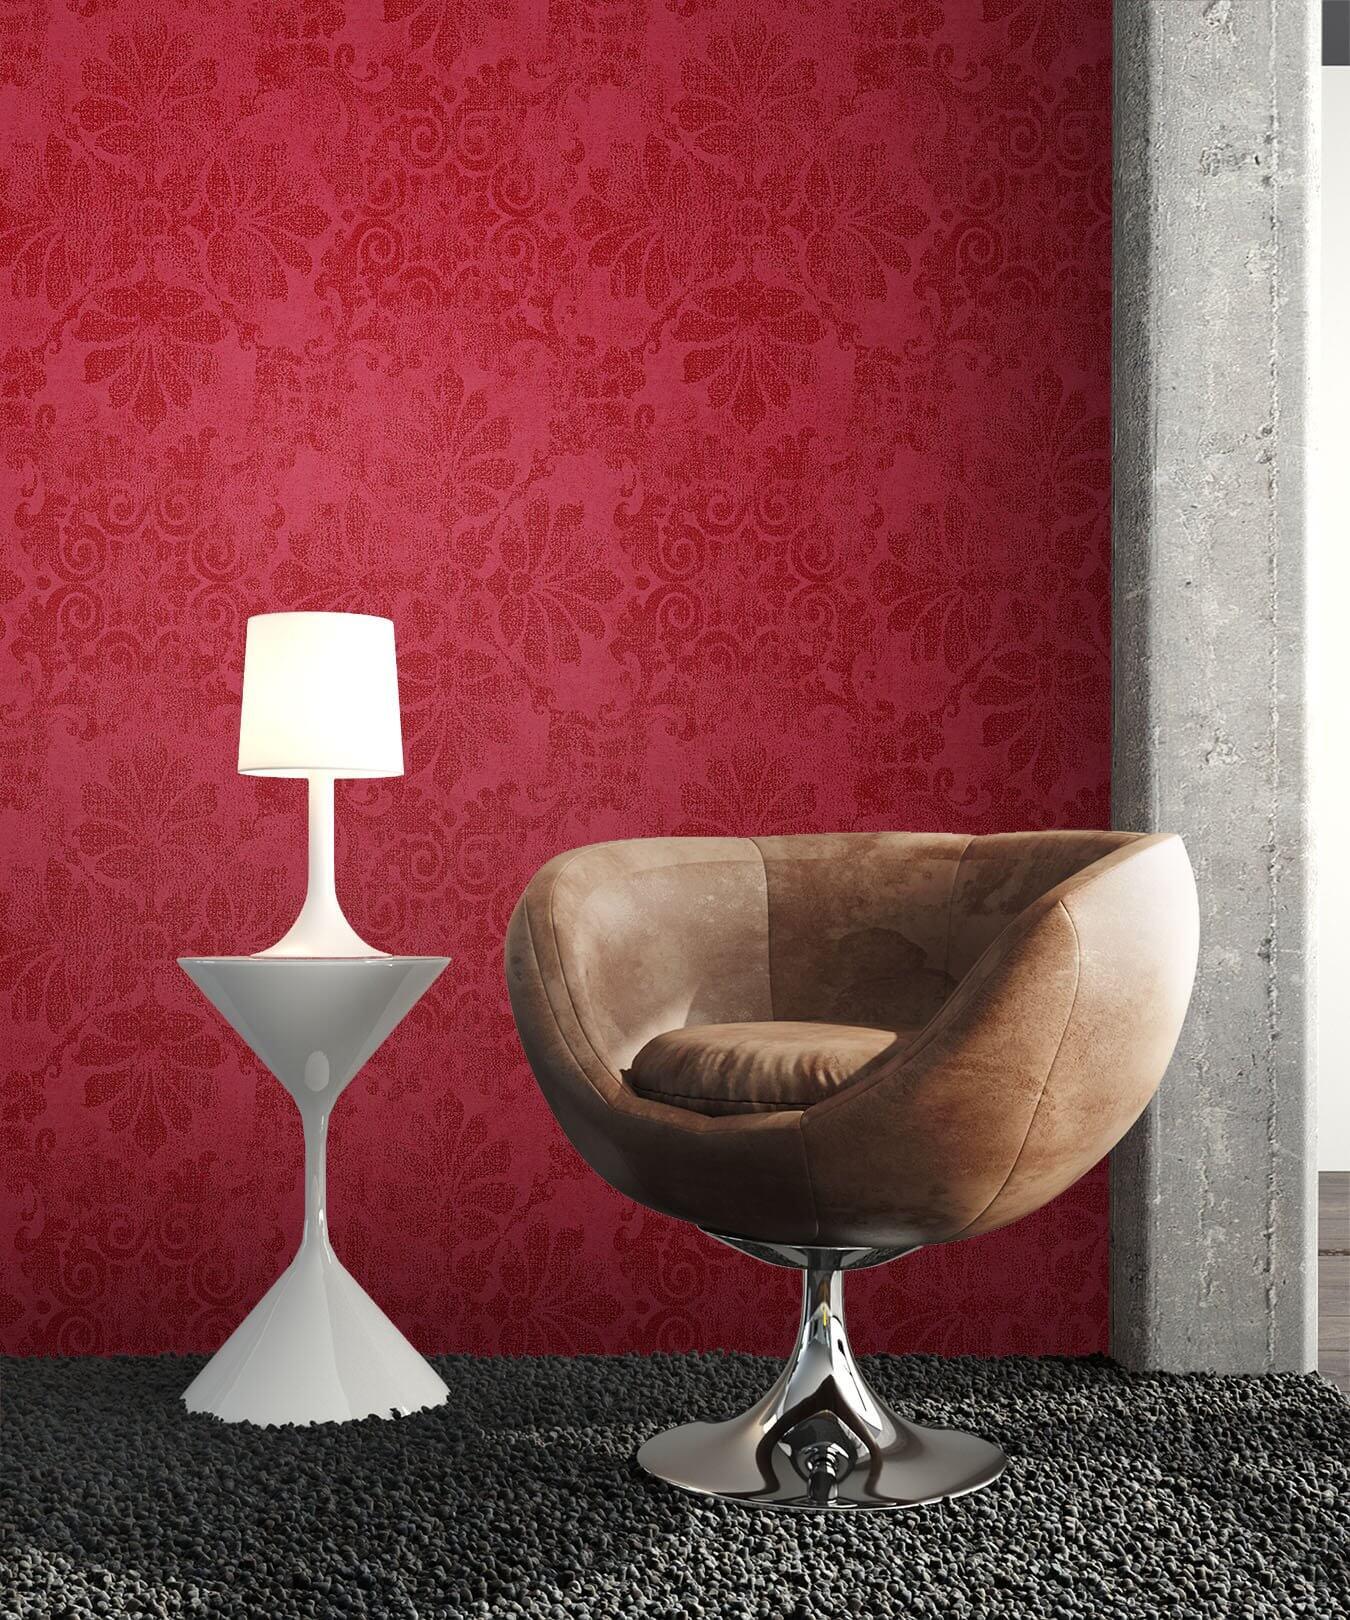 vliestapete metallic barock ornament b ro diele flur kinder schlafen wohnen newroom. Black Bedroom Furniture Sets. Home Design Ideas